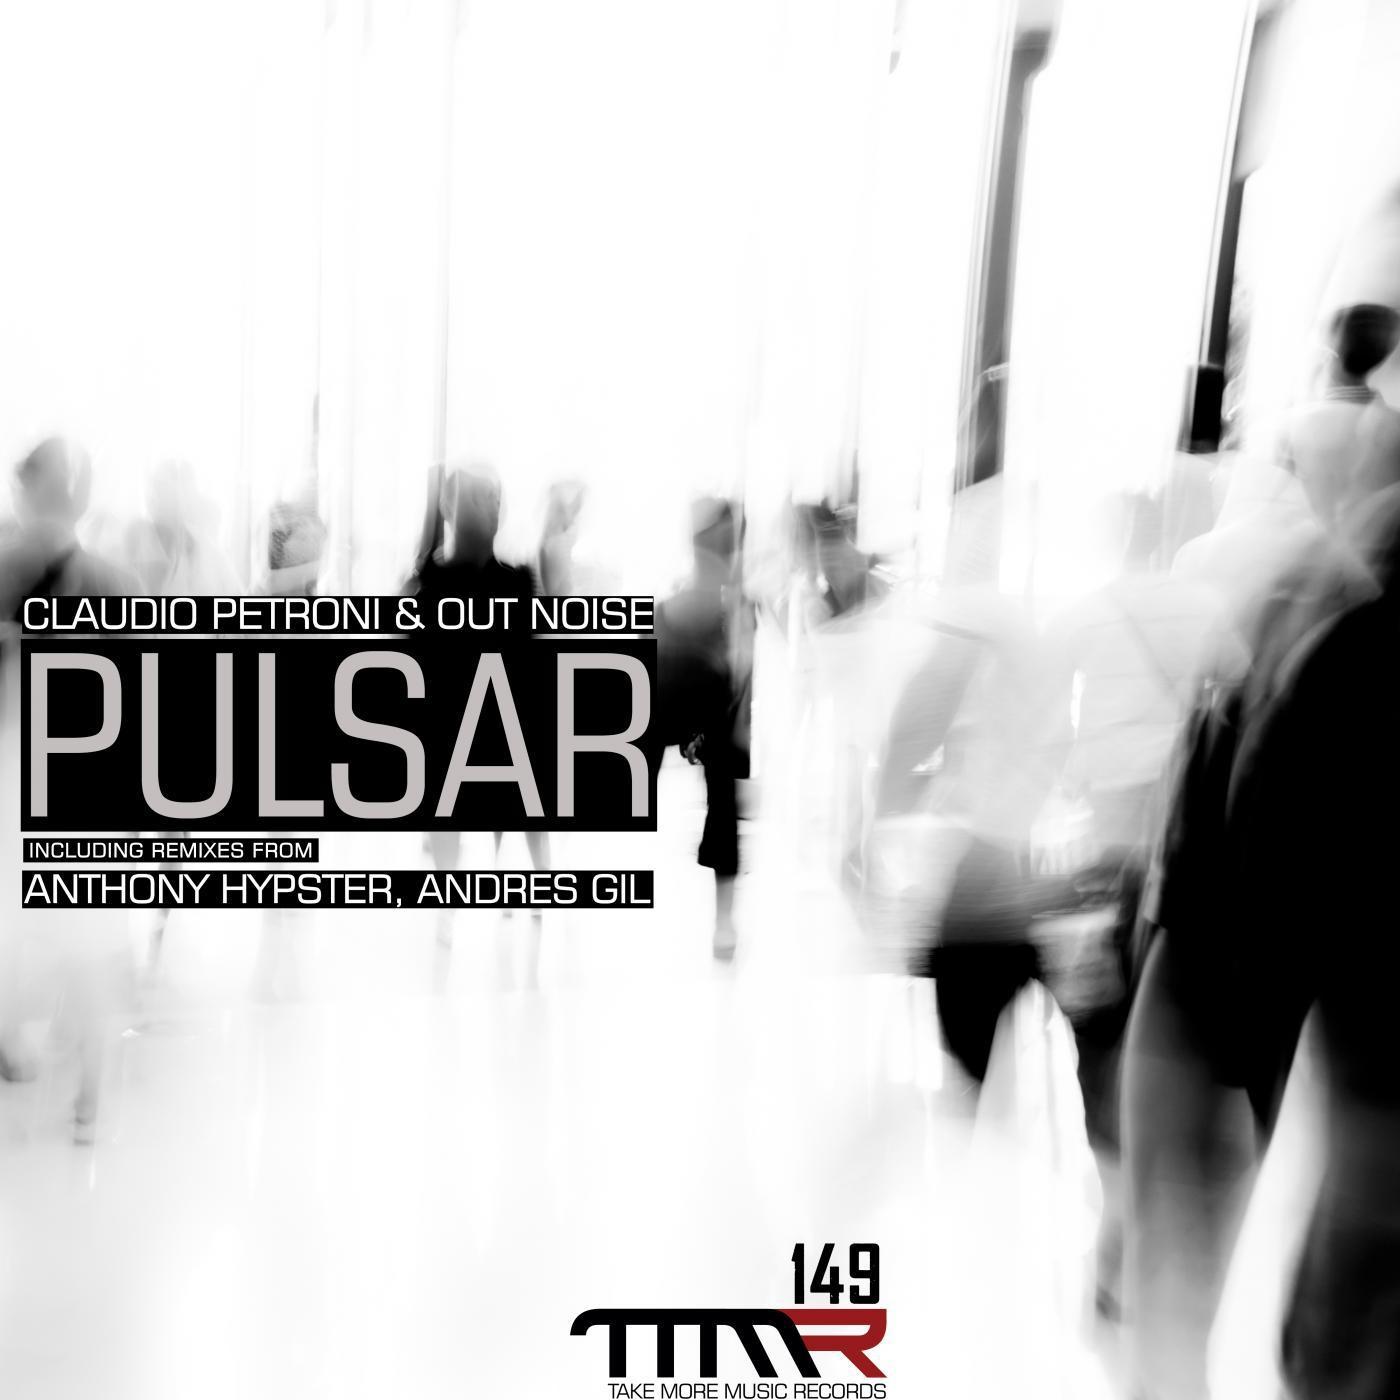 Claudio Petroni & Out Noise - Pulsar (Original mix)